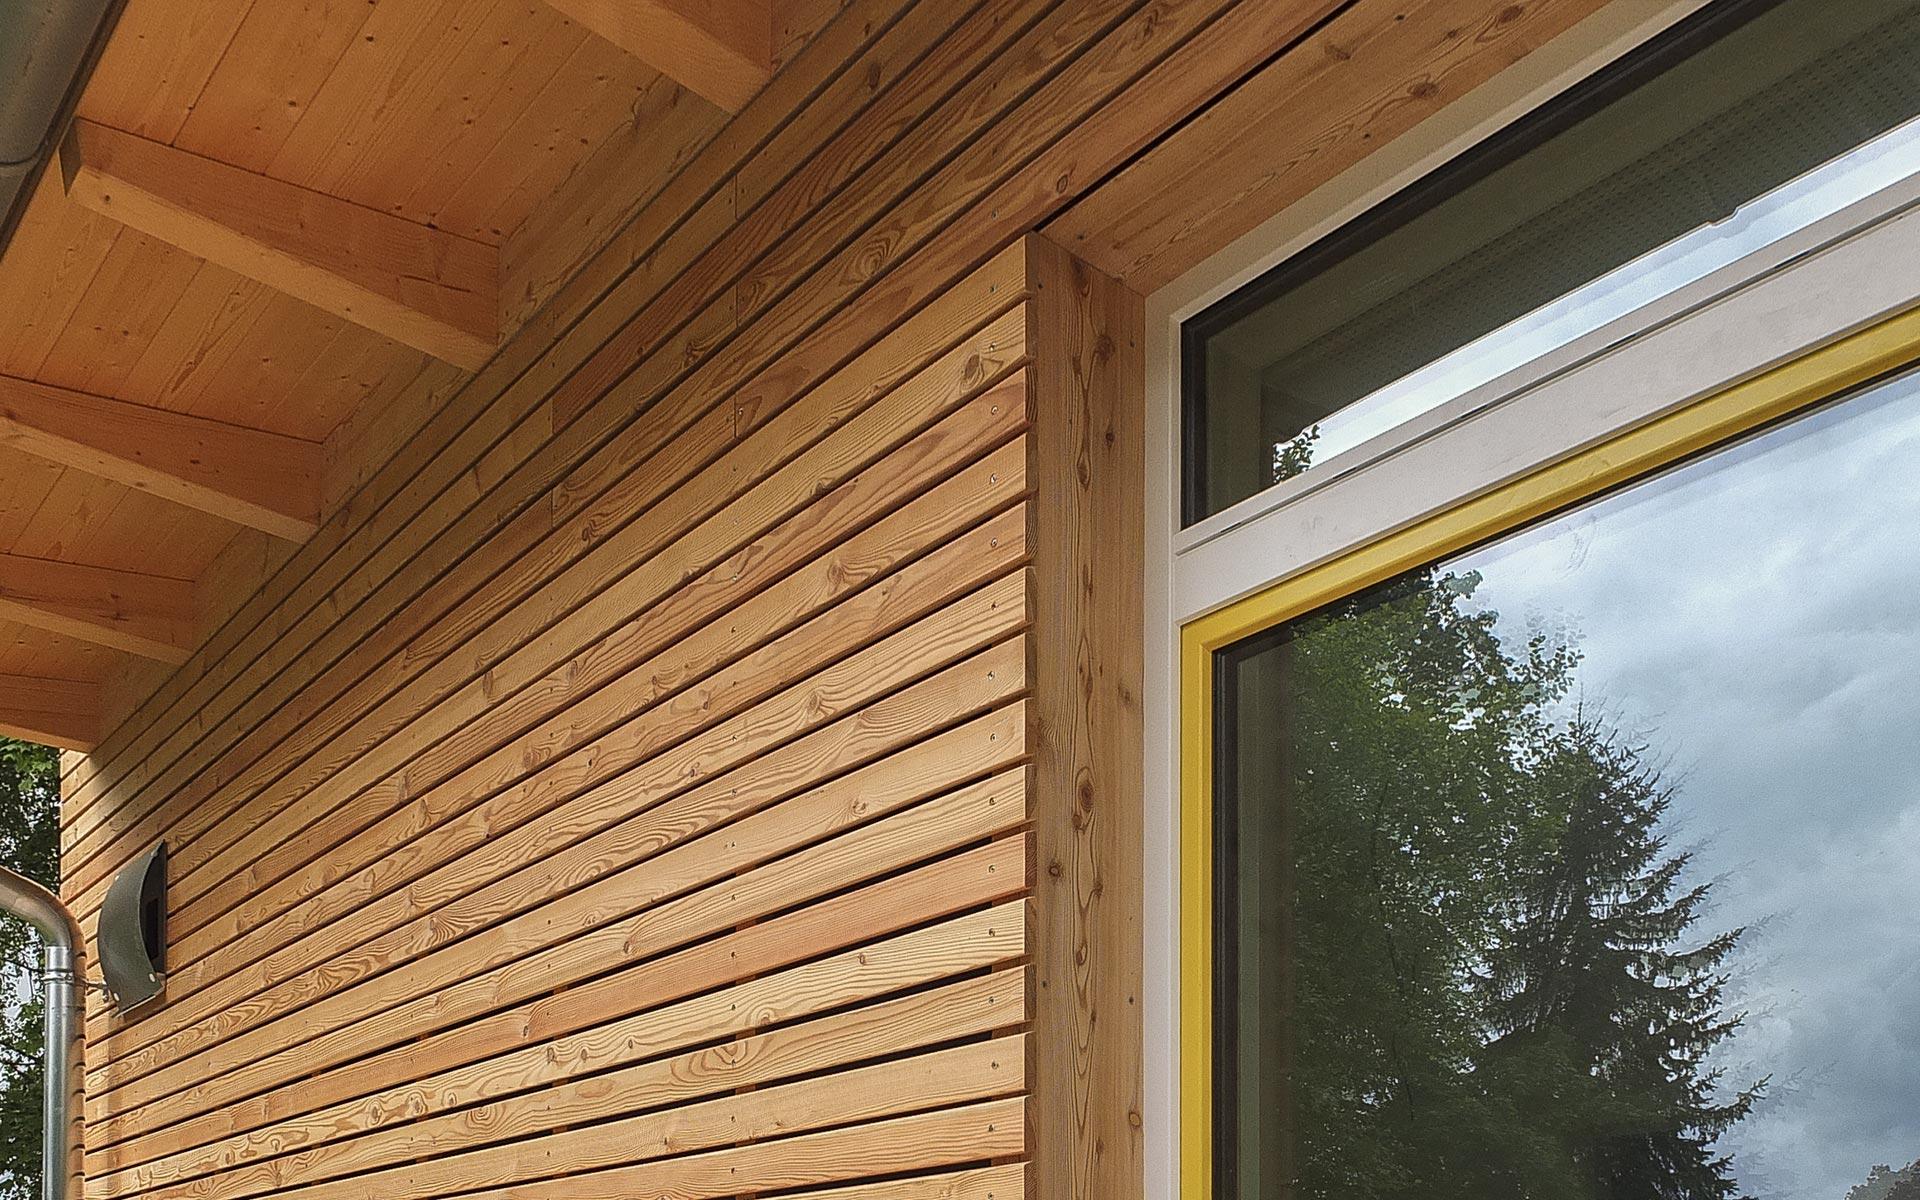 Kita Fellheim Fassade aus Holz